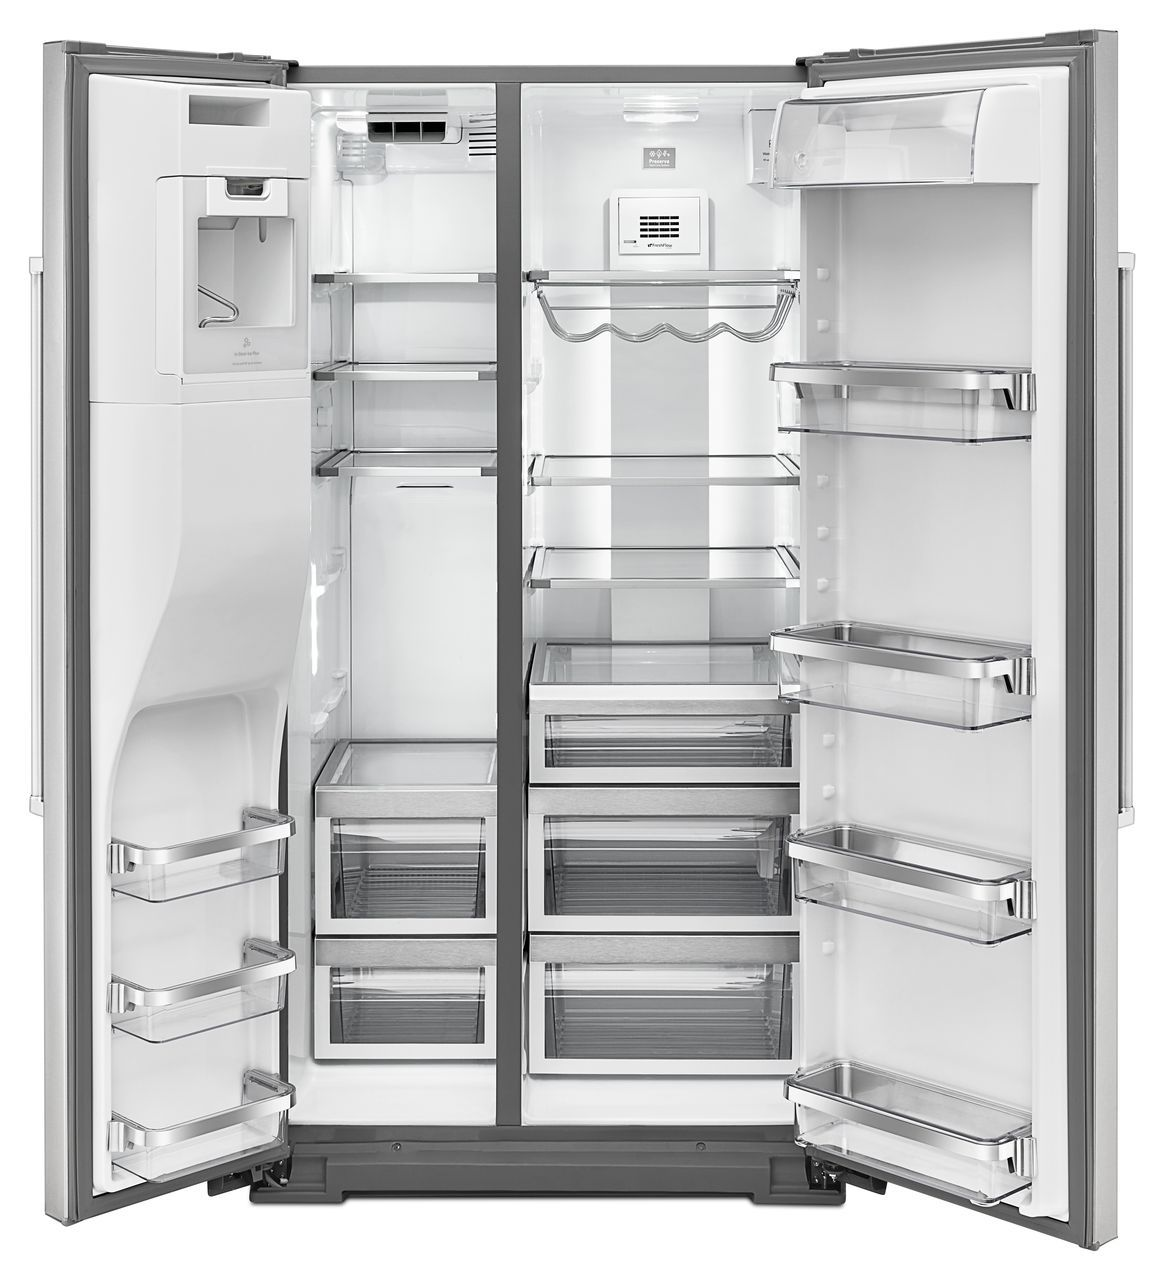 Kitchenaid Counter Depth Side By Refrigerator Manual : Kitchen ...